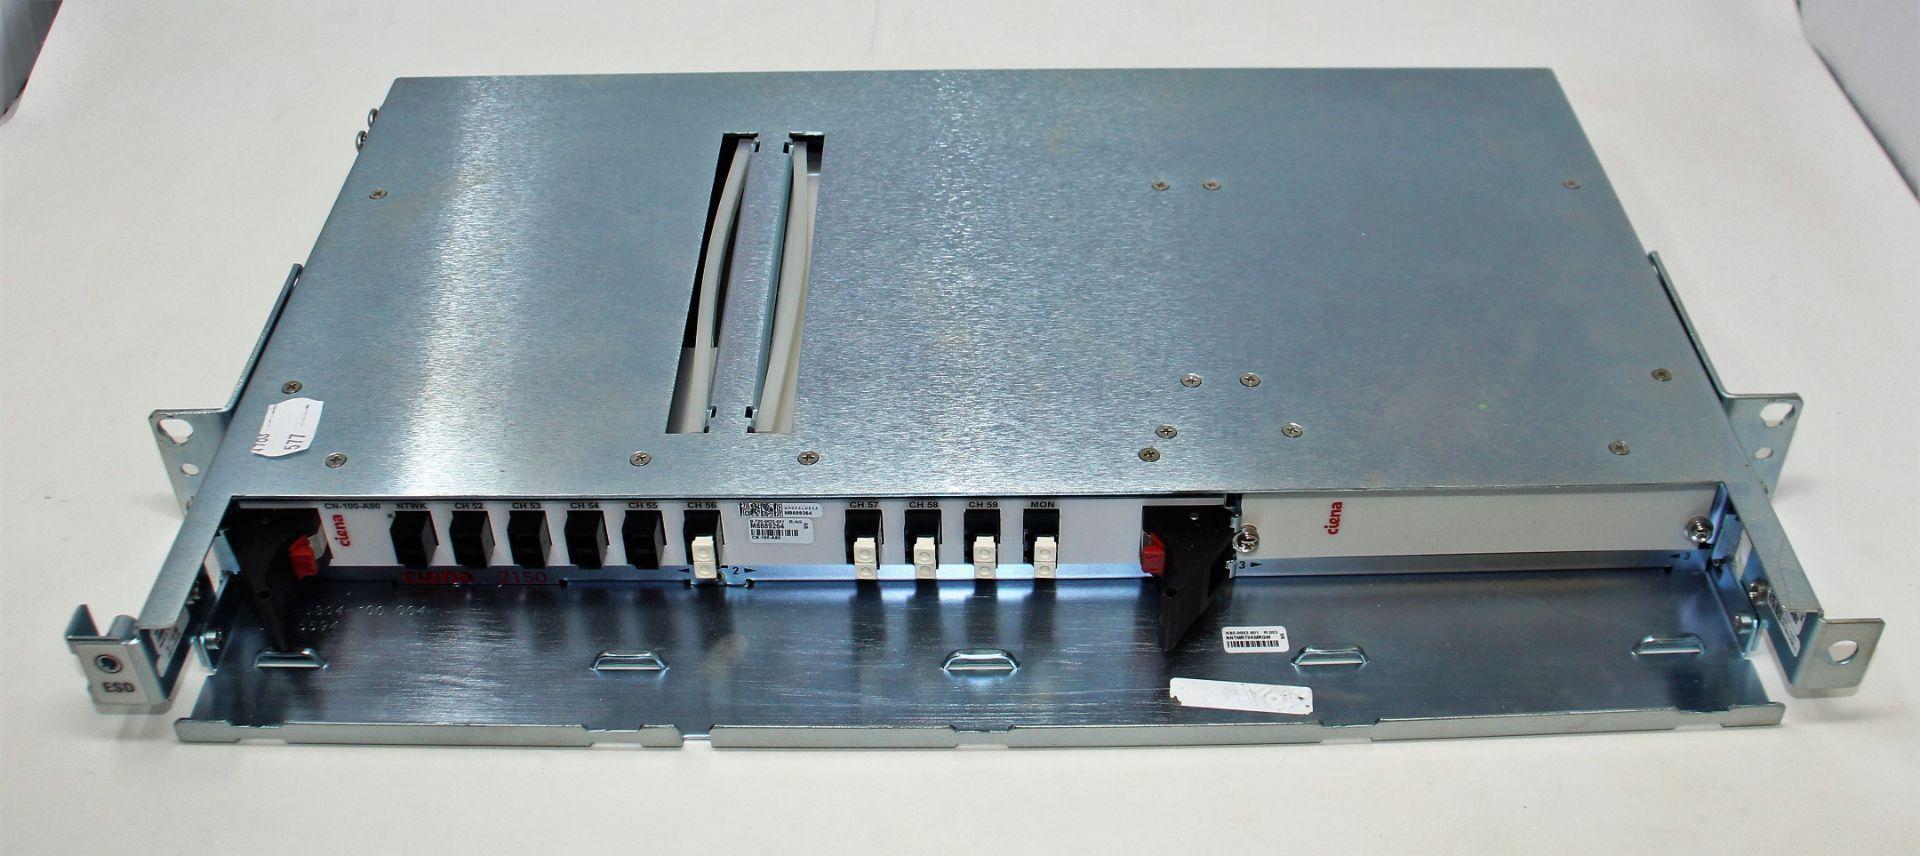 A pre-owned Ciena CN-100-A80 B-720-0022-001 WM0AALWEAA M8942765 DWDM Module (Untested, sold as